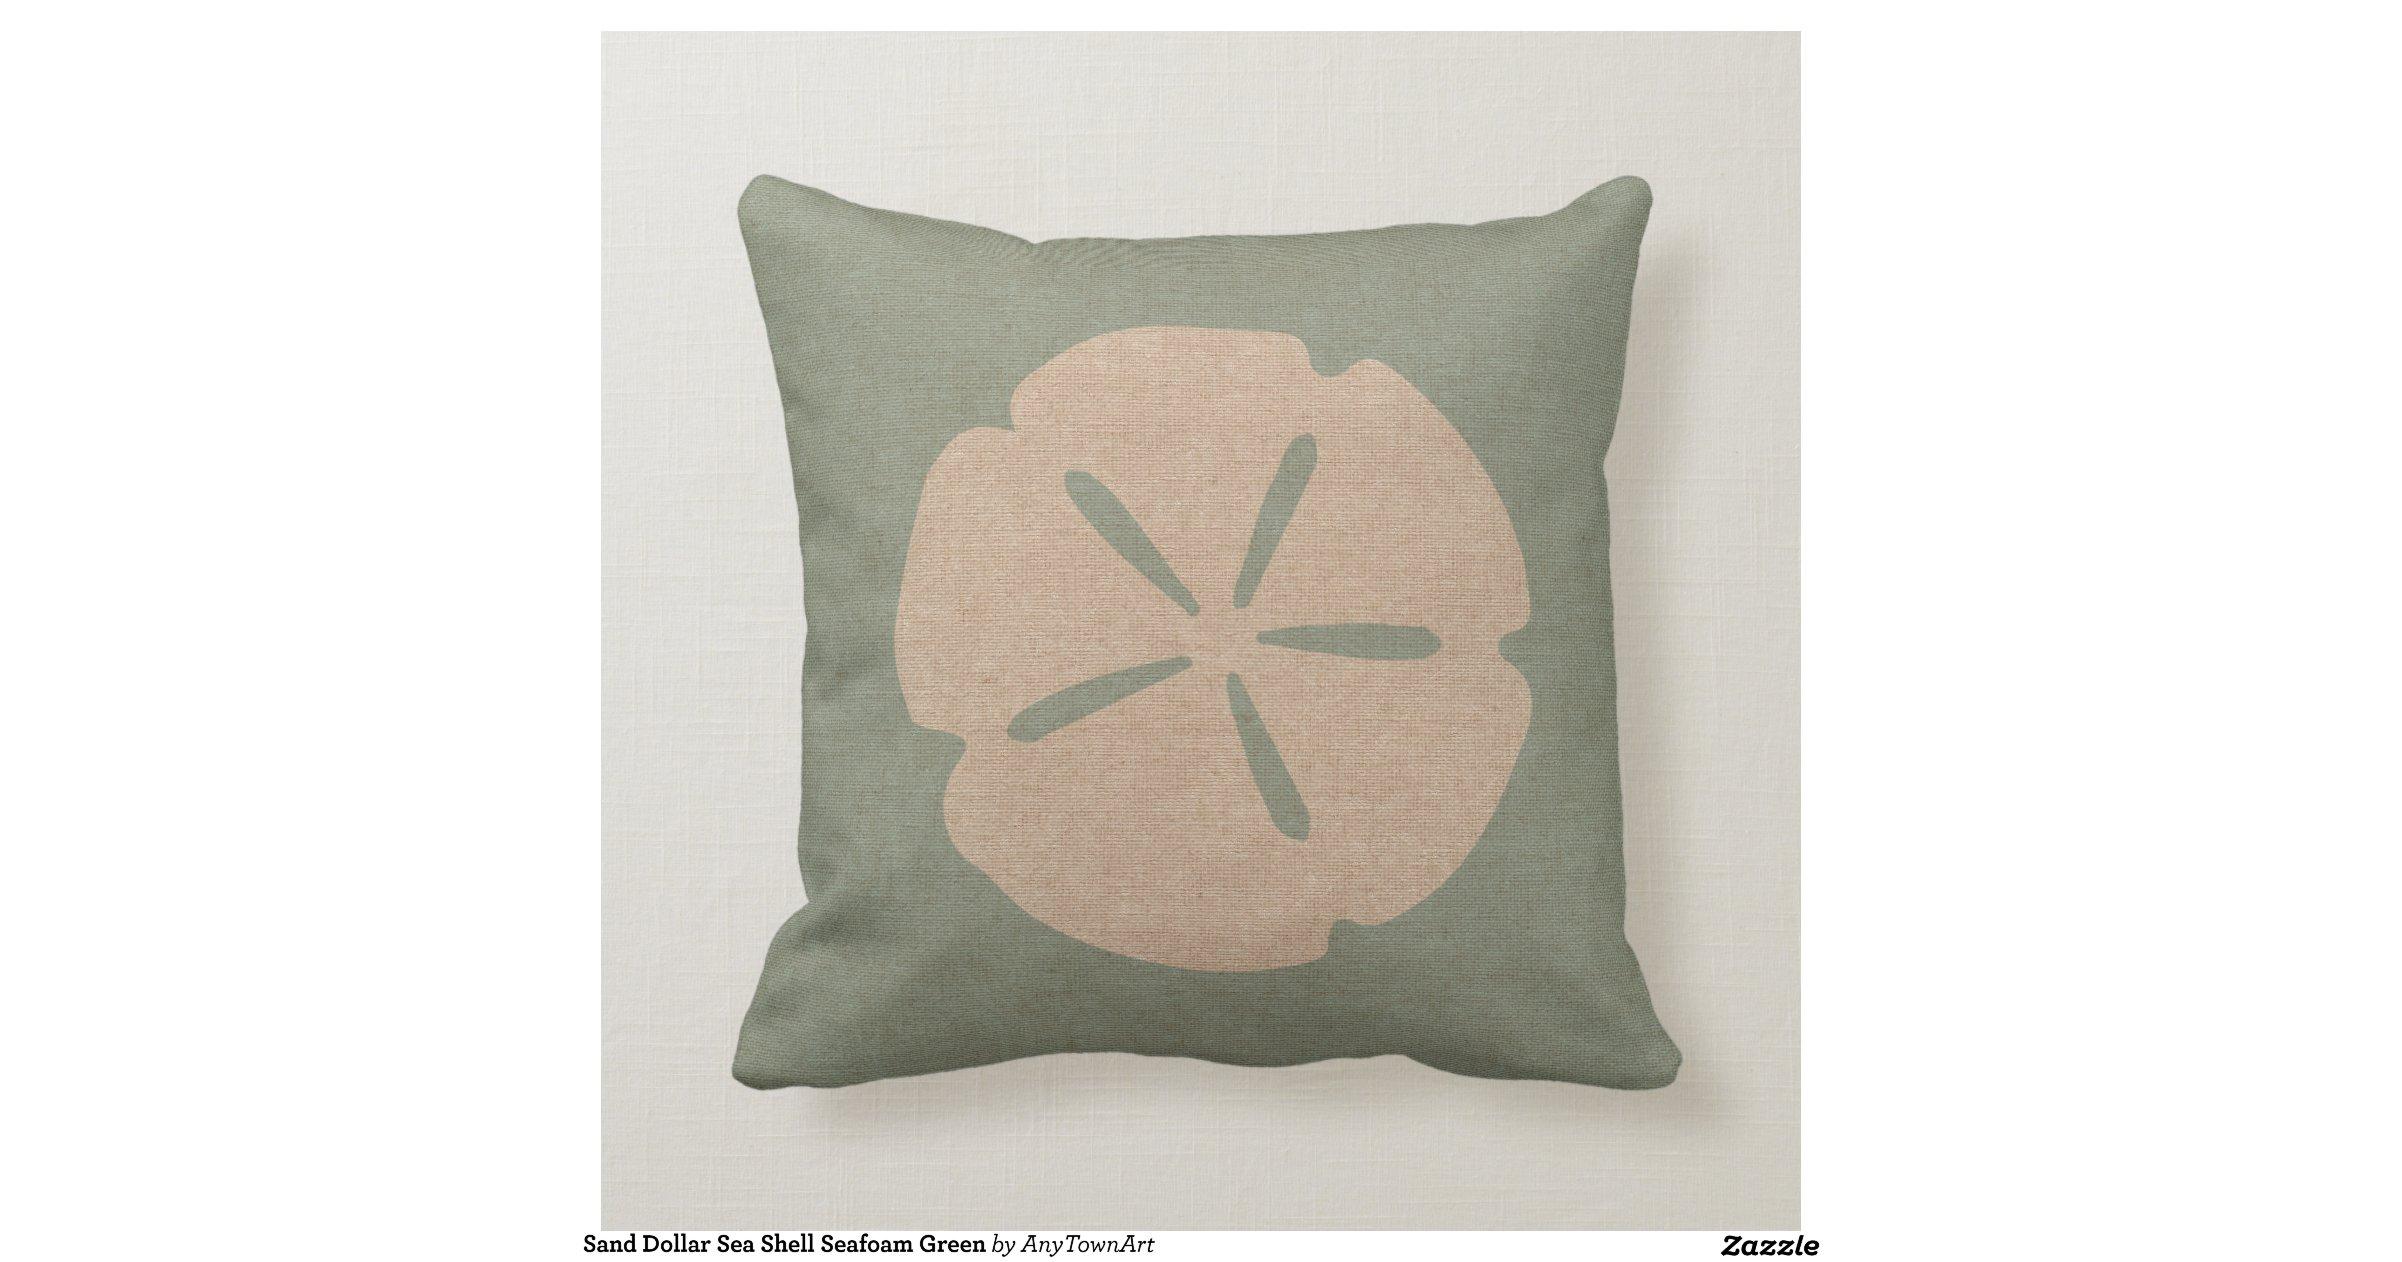 Throw Pillow Seafoam Green : Sand Dollar Sea Shell Seafoam Green Throw Pillows Zazzle